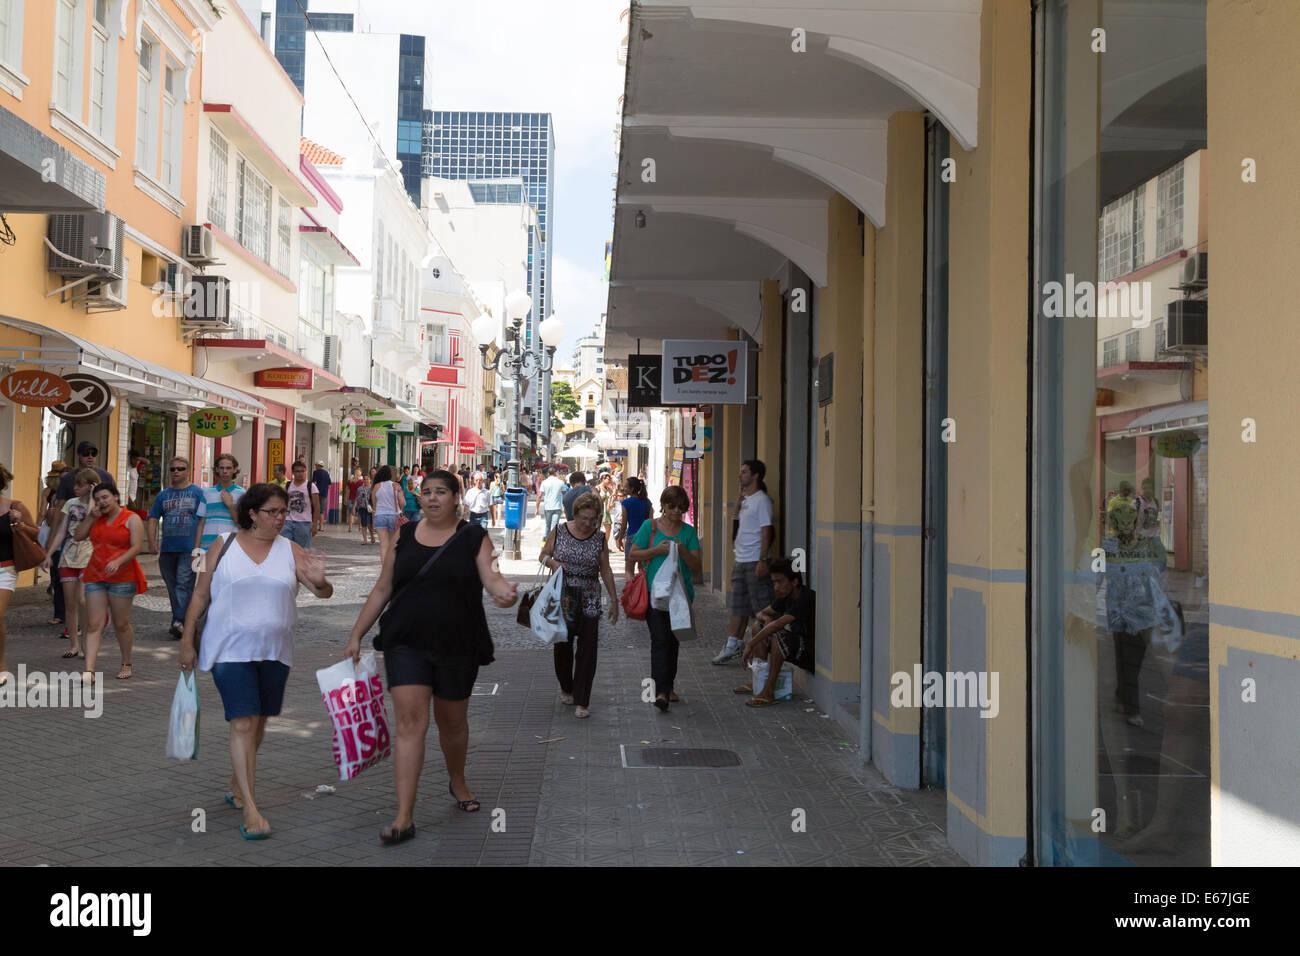 Rua Trajano, pedestrian street in Florianopolis historic city center. Santa Catarina, Brazil - Stock Image